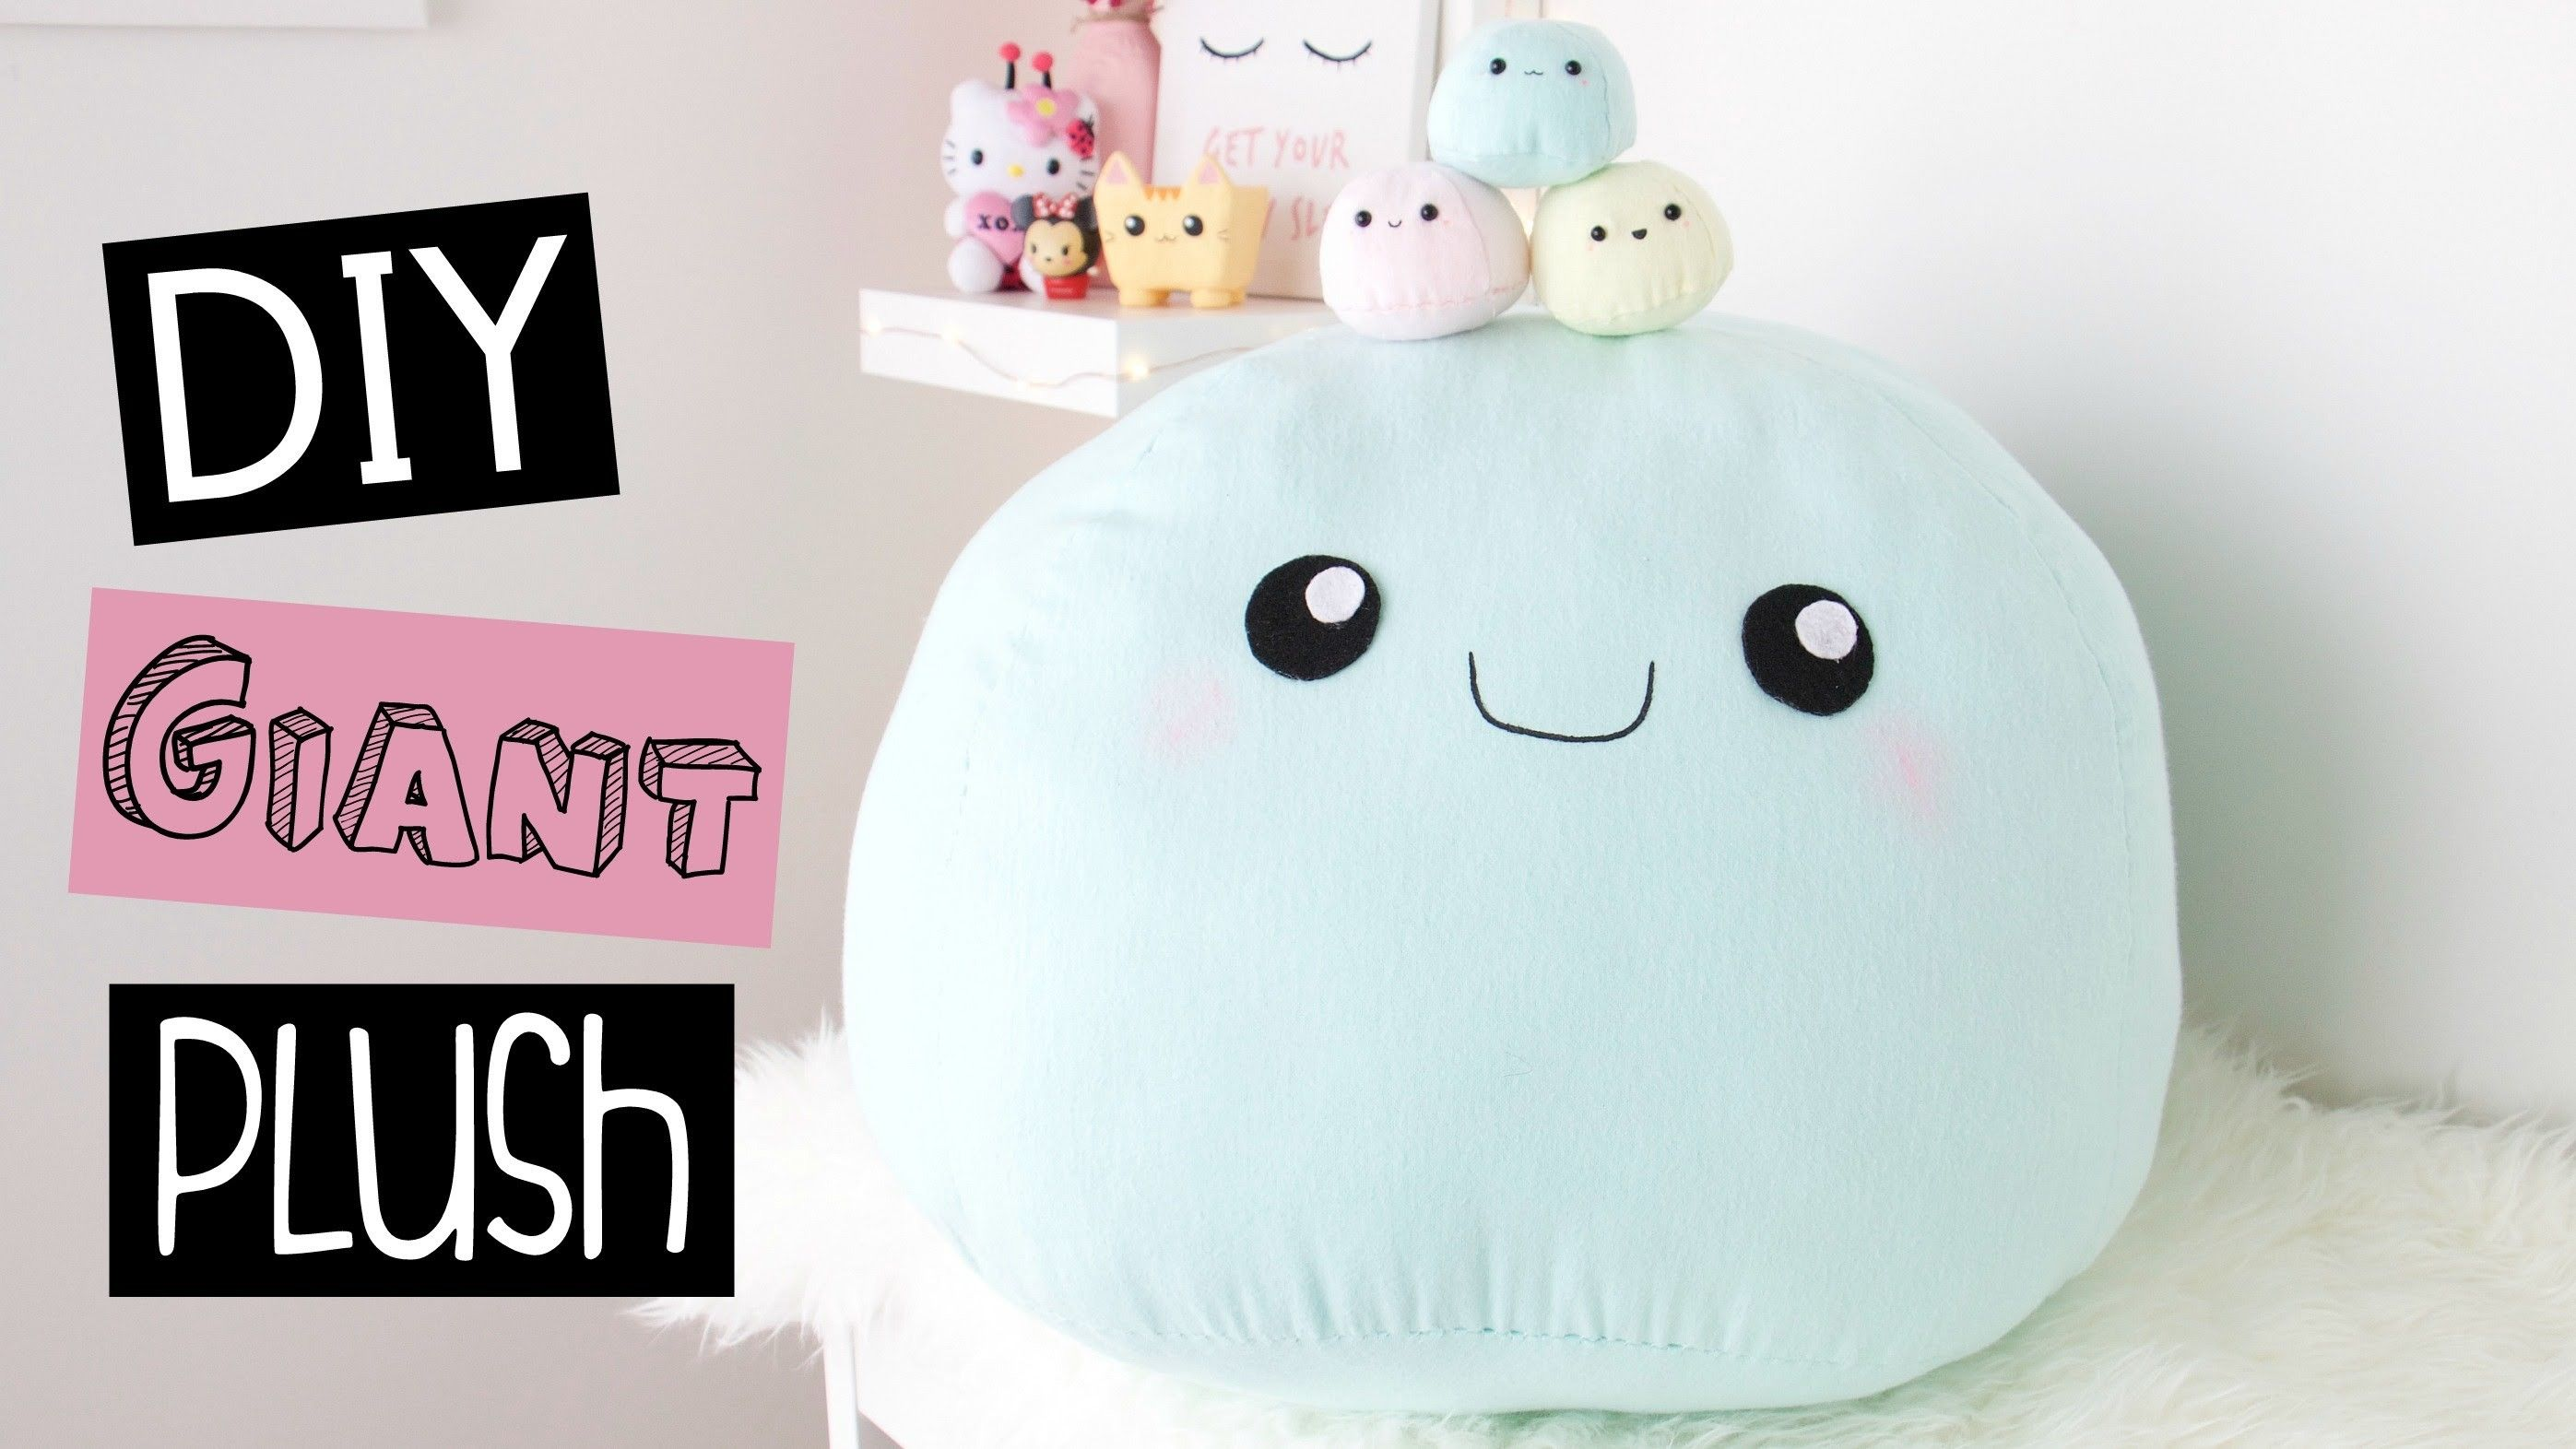 Diy Giant Plush Pillow Room Decor Giant Plush Kawaii Diy Plush Pillows [ 1572 x 2794 Pixel ]